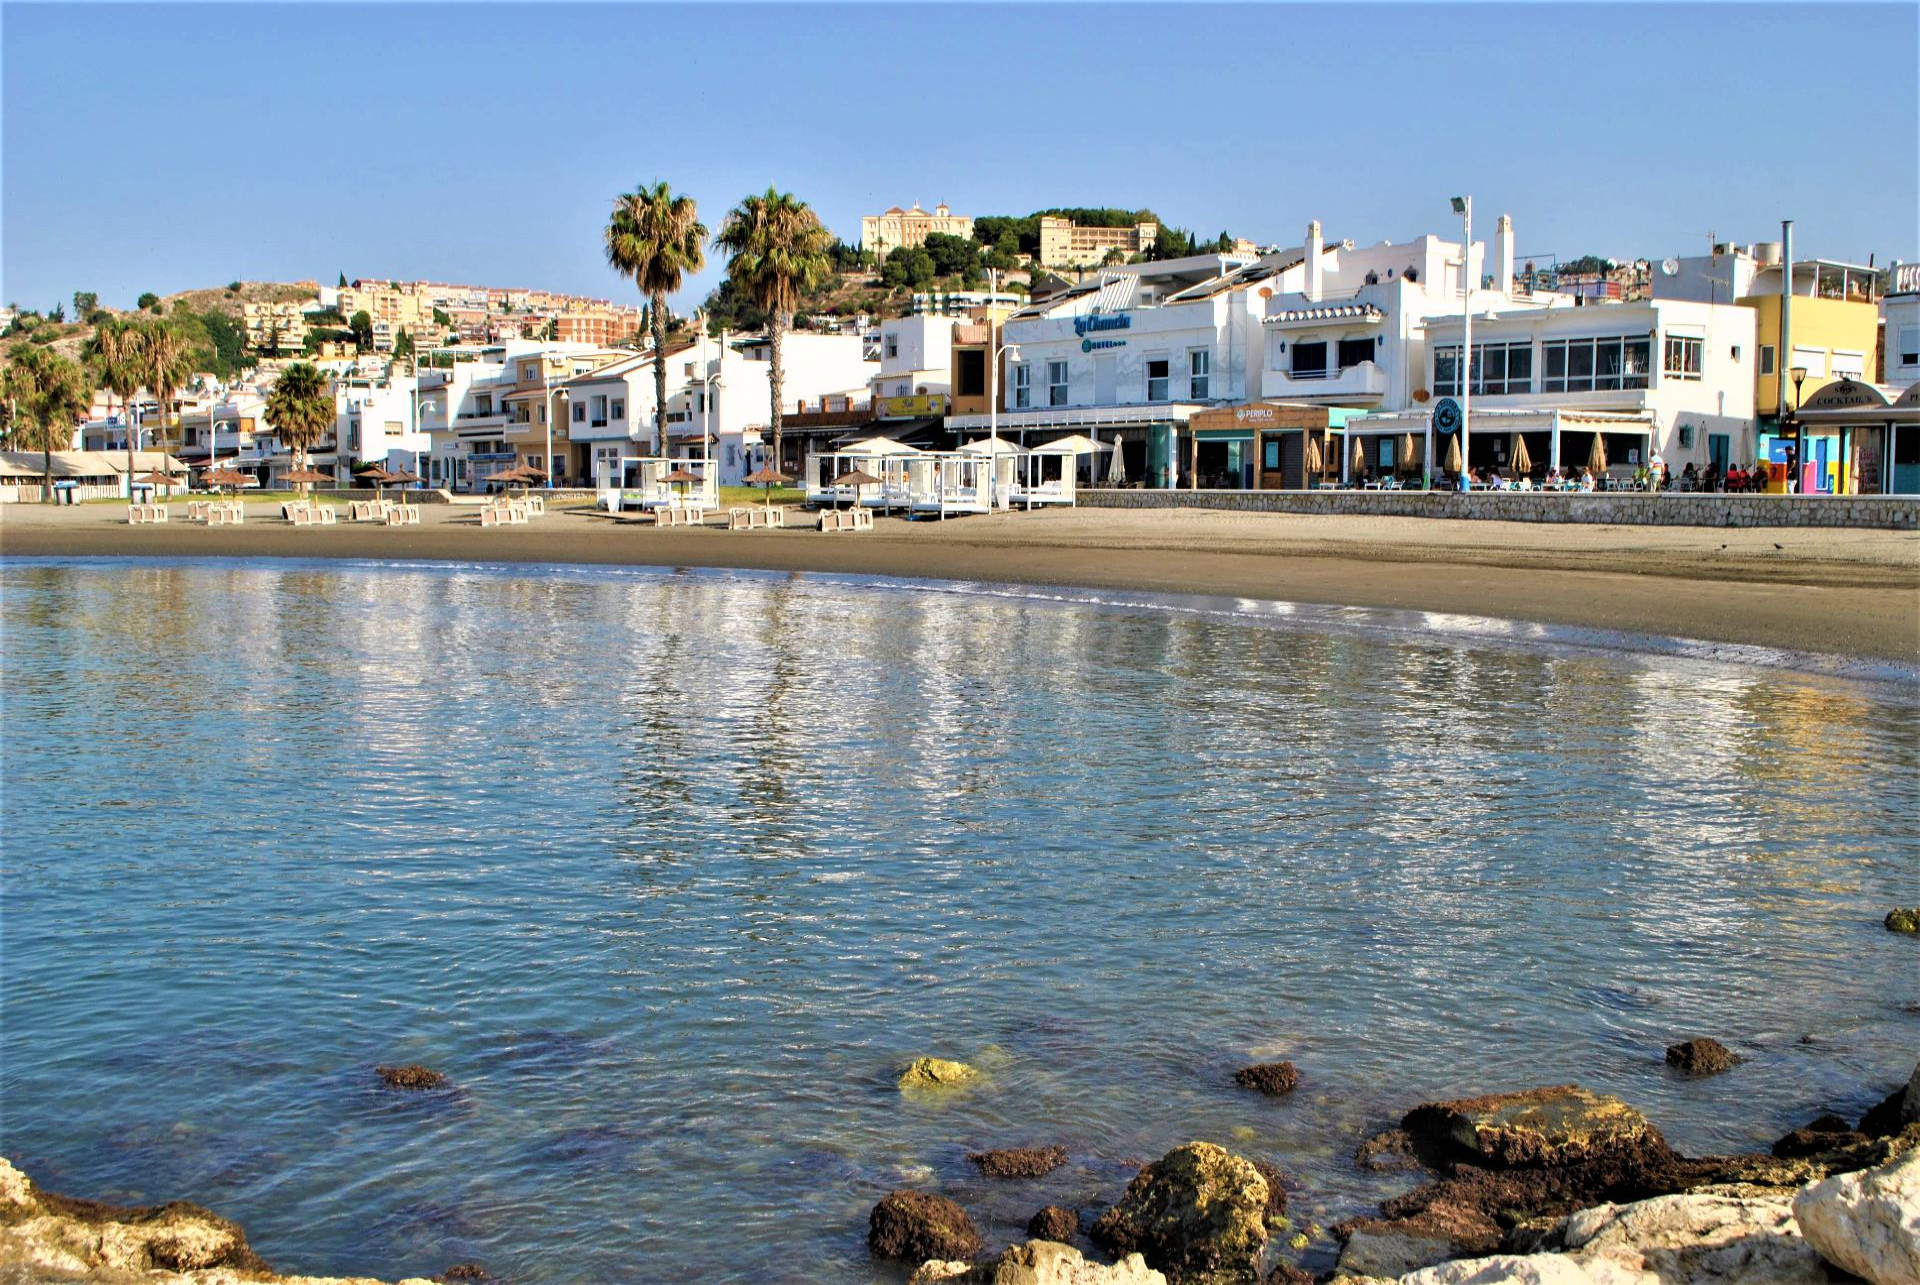 Ferienwohnung für 4 Personen ca 51 m² in Malaga Andalusien Costa del Sol